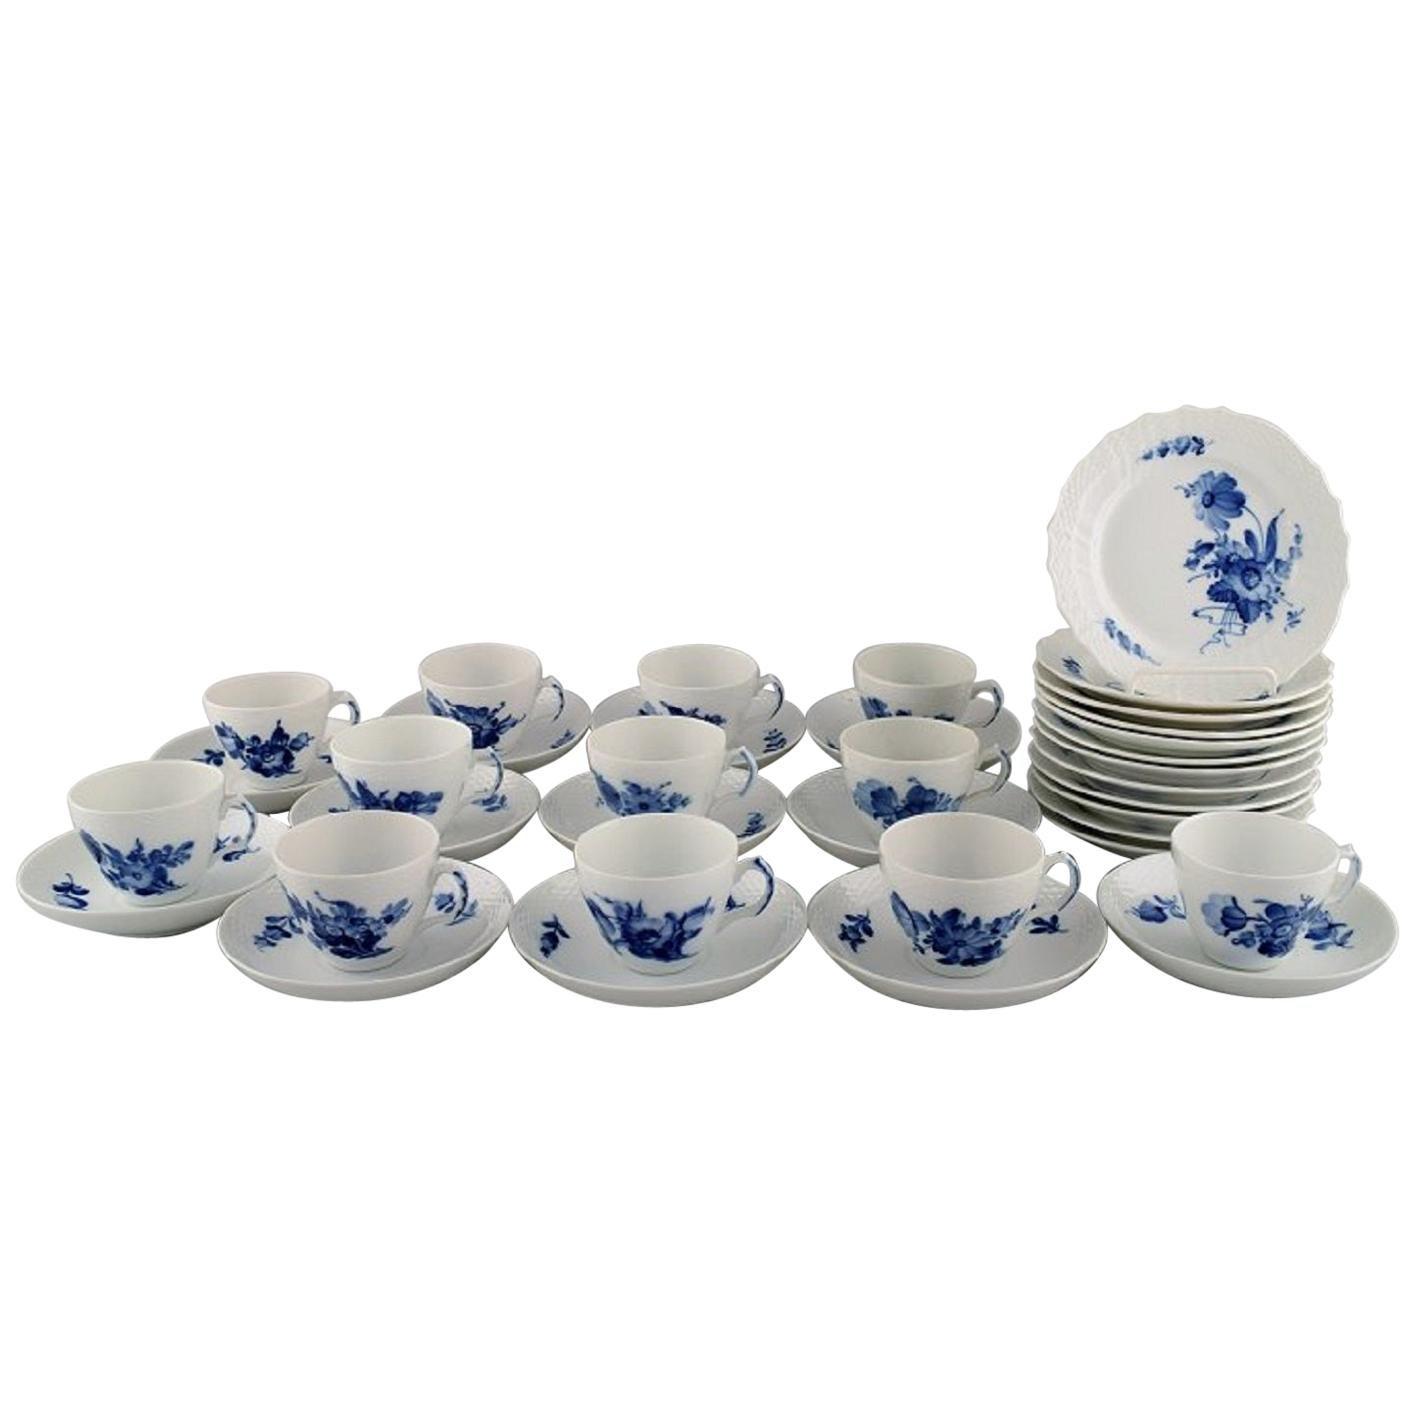 Royal Copenhagen Blue Flower Curved Coffee Service for Twelve People, 1960s